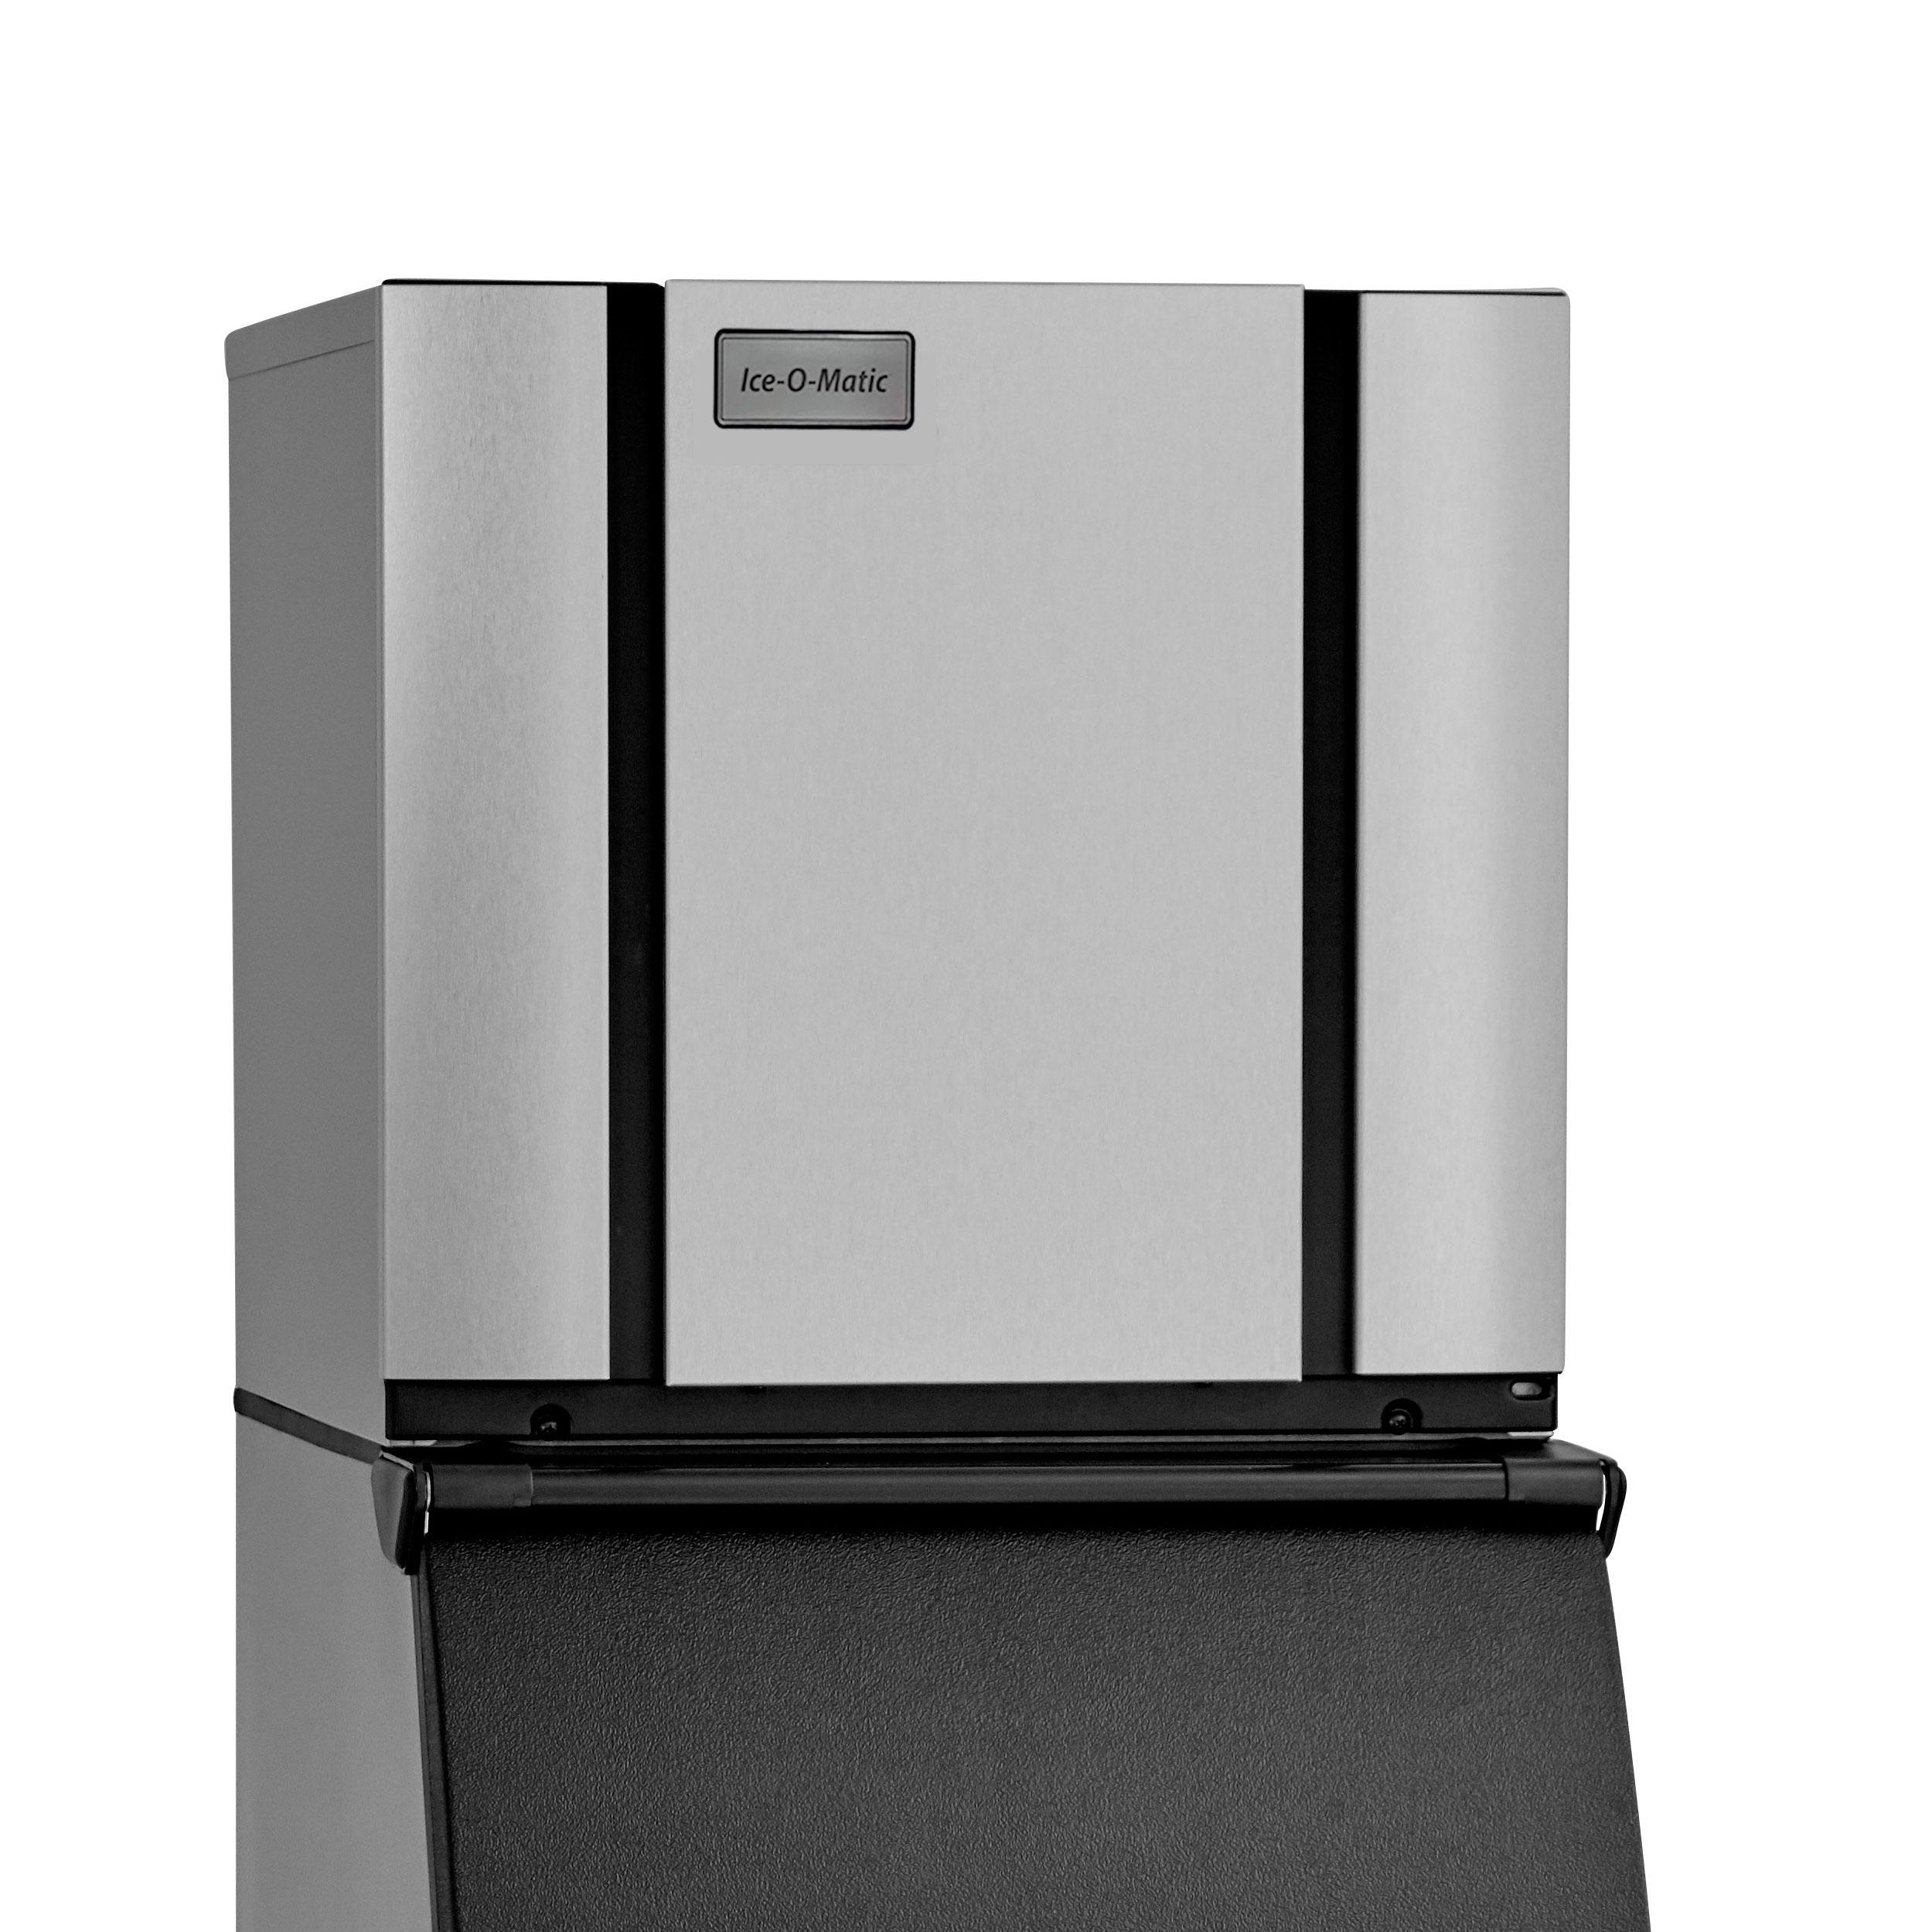 Ice-O-Matic CIM0836FW ice maker, cube-style